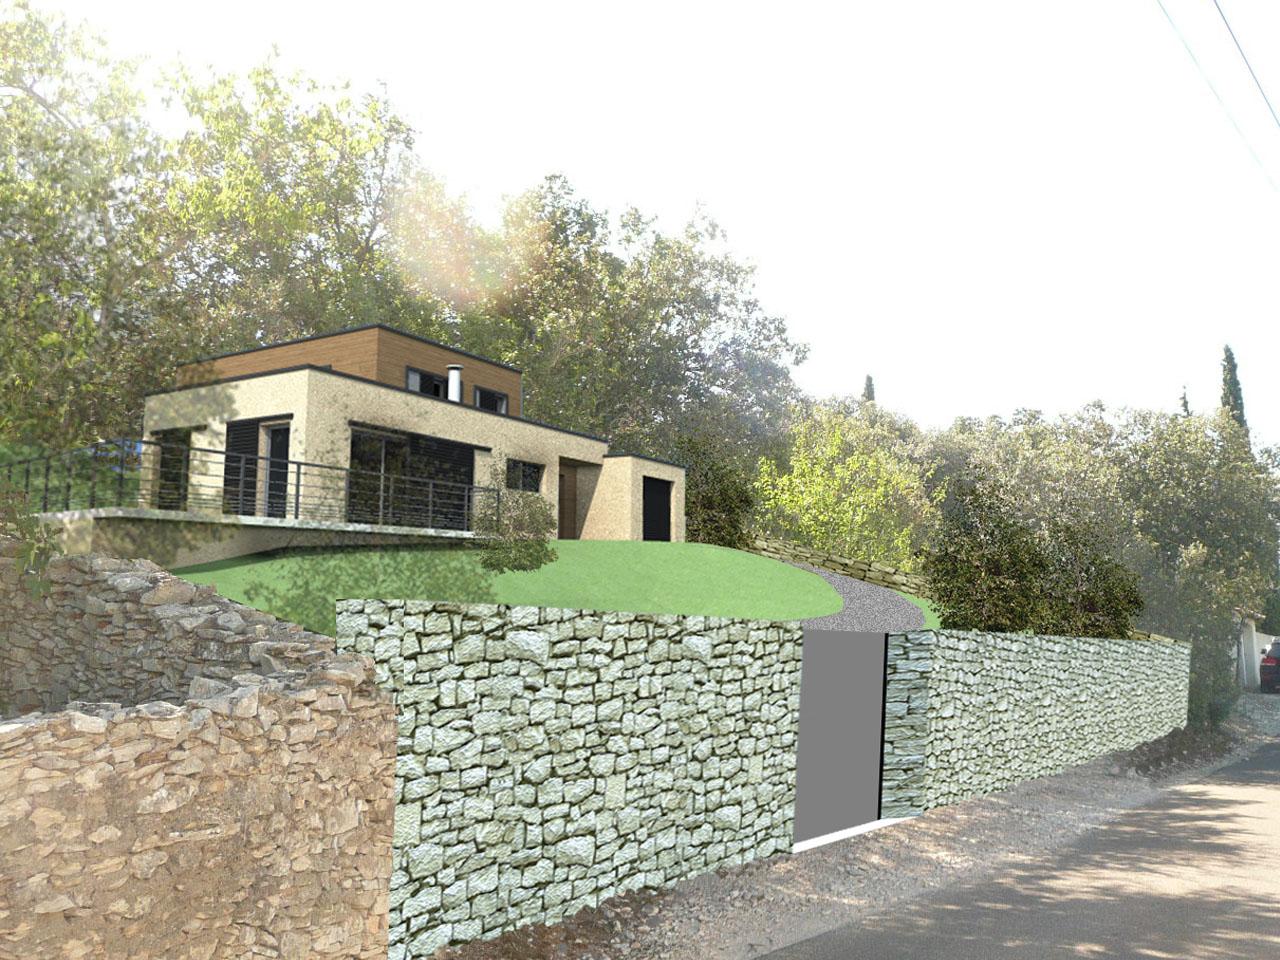 Maison J. | Construction neuve - Agence d'architecture Brayer-Hugon